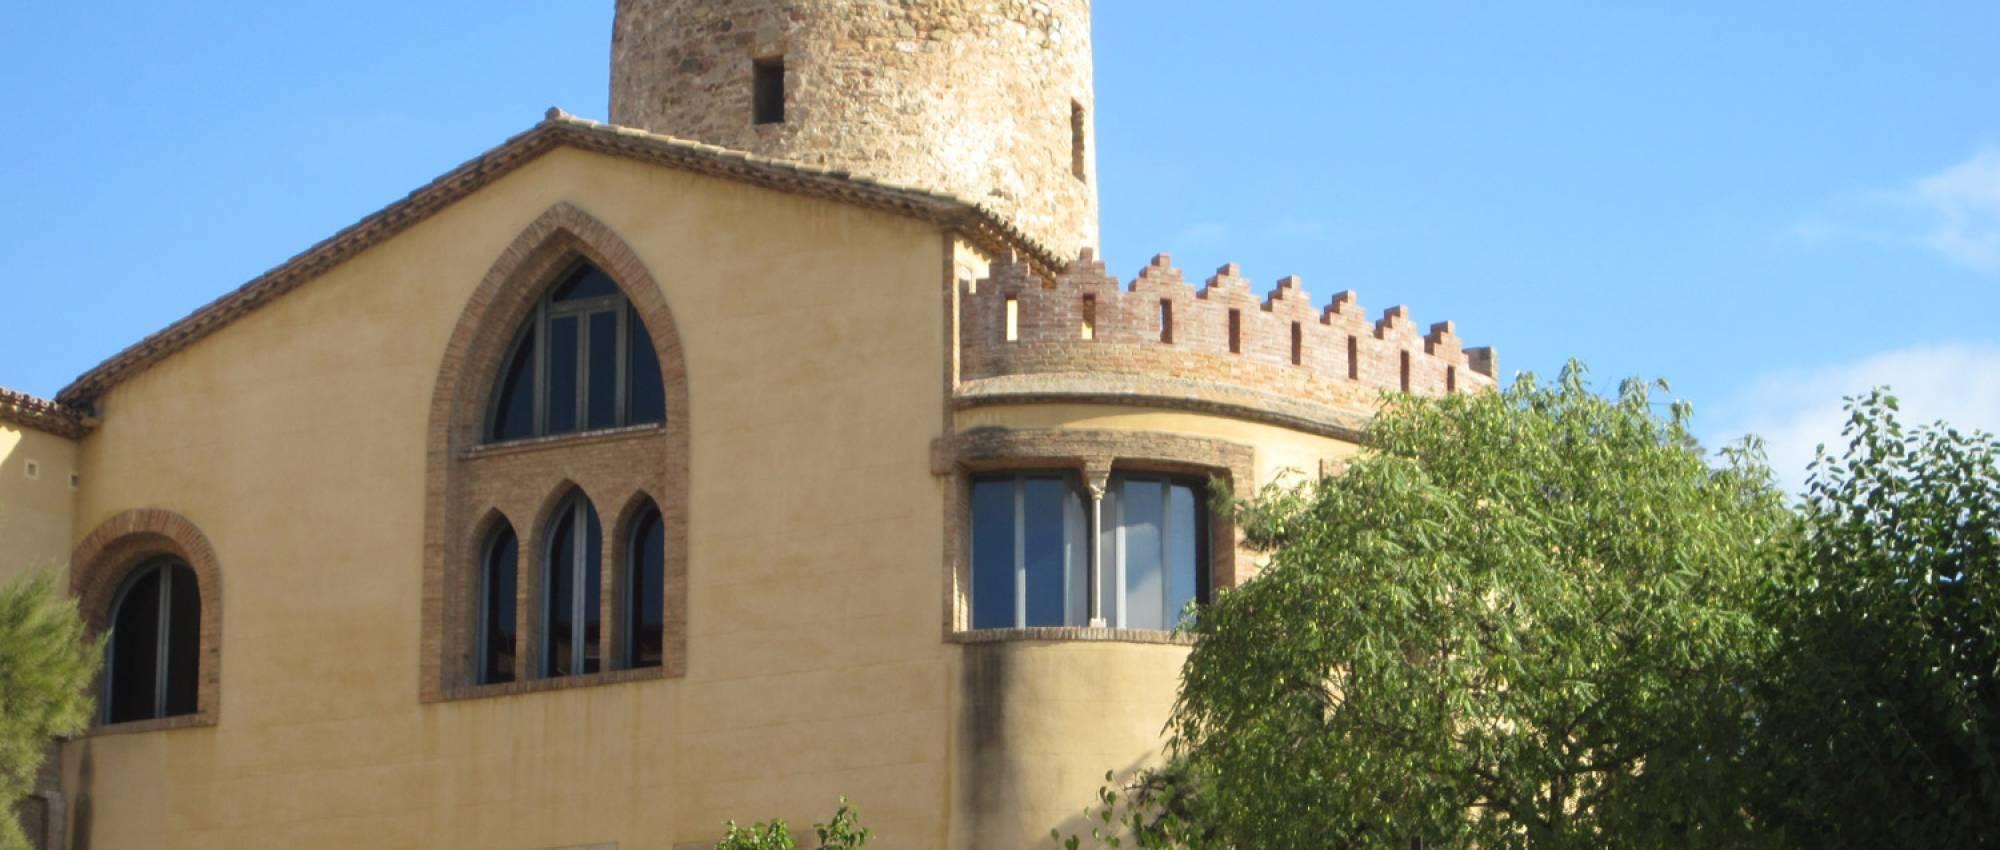 Vista exterior de la sede del museo. CC BY-SA 3.0 - Pallares  / Wikimedia Commons